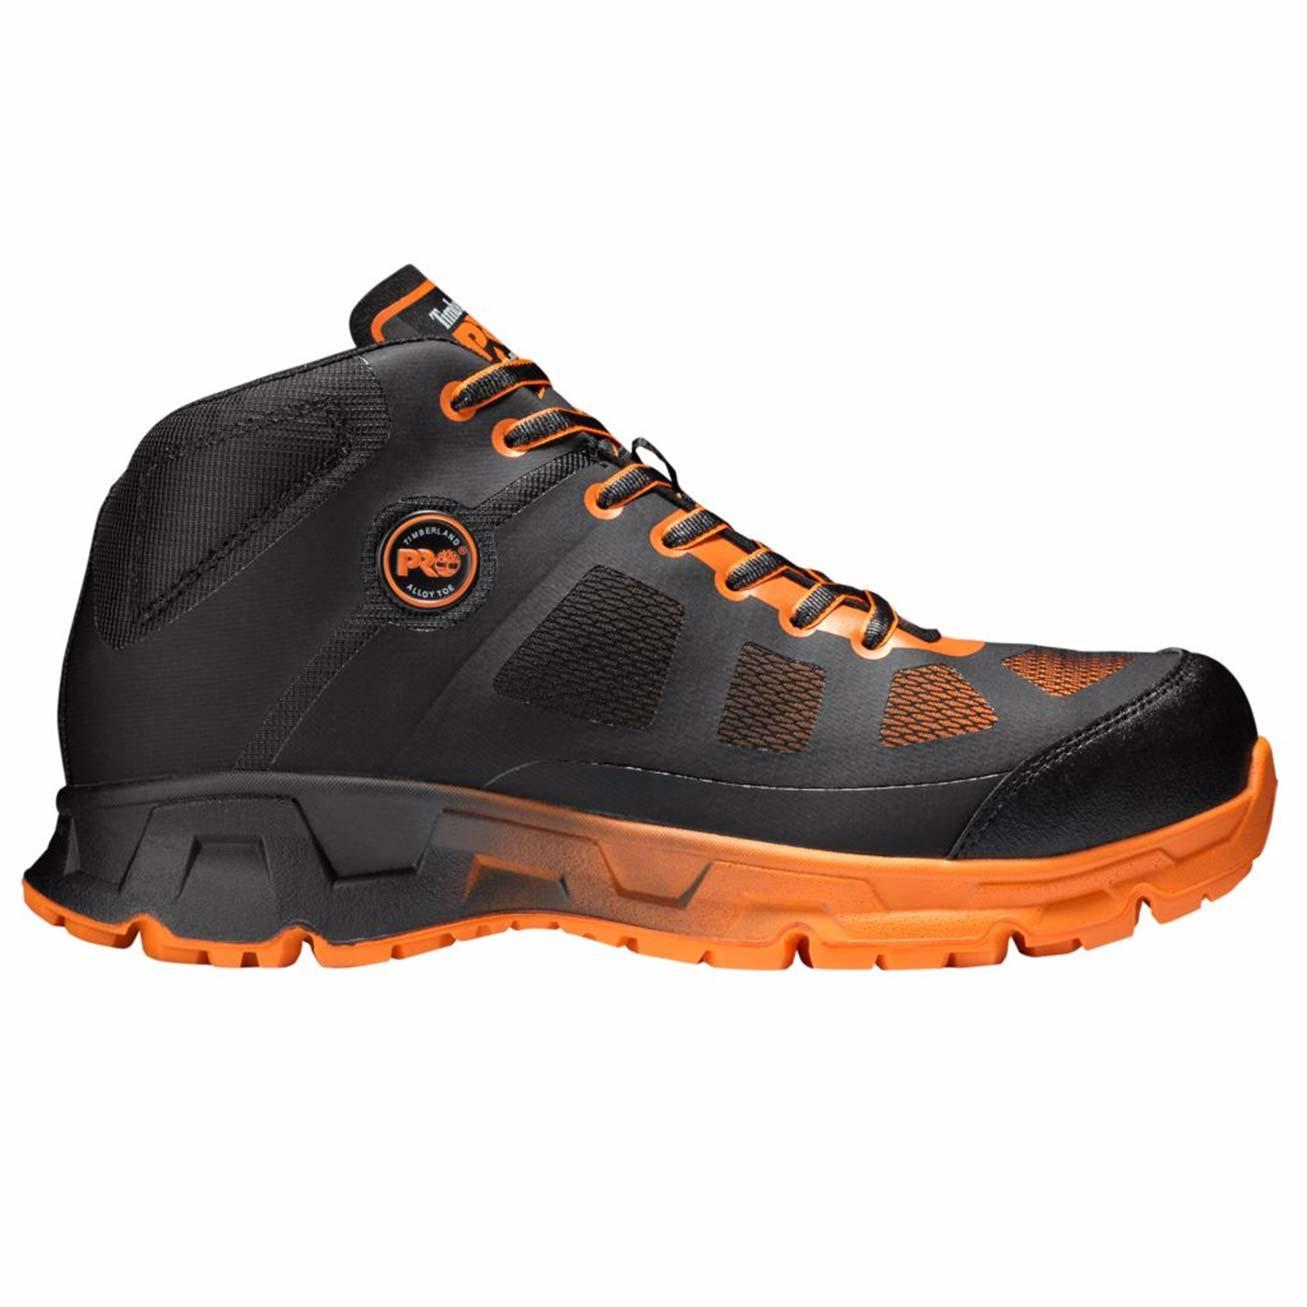 Mens Work Shoes Bradford